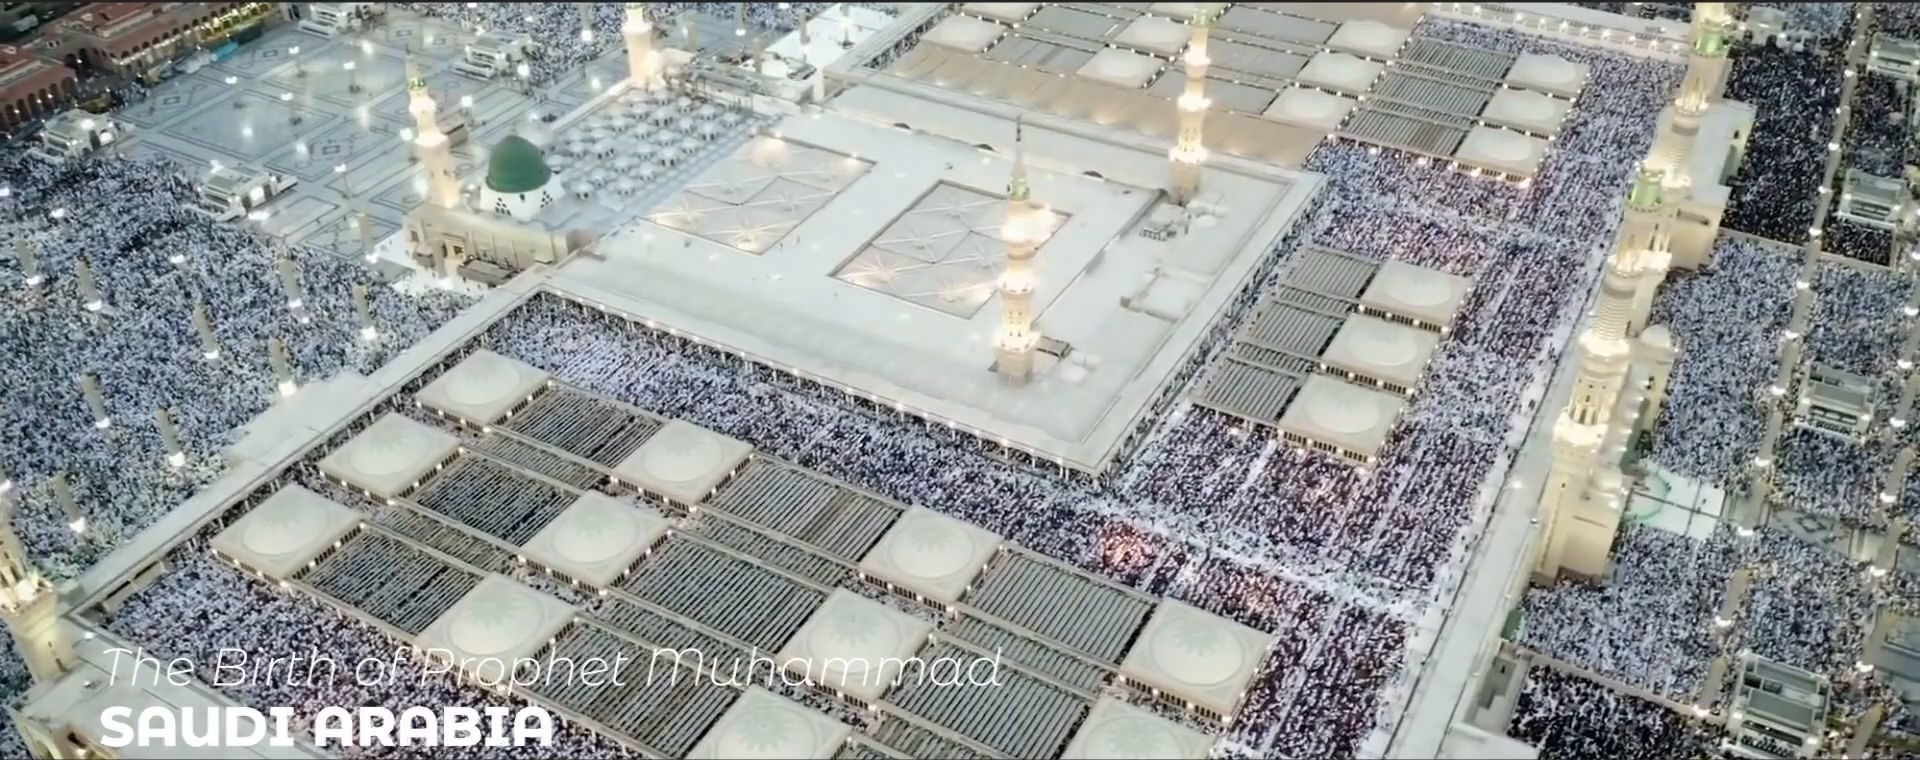 THE BIRTH OF THE PROPHET MUHAMMAD